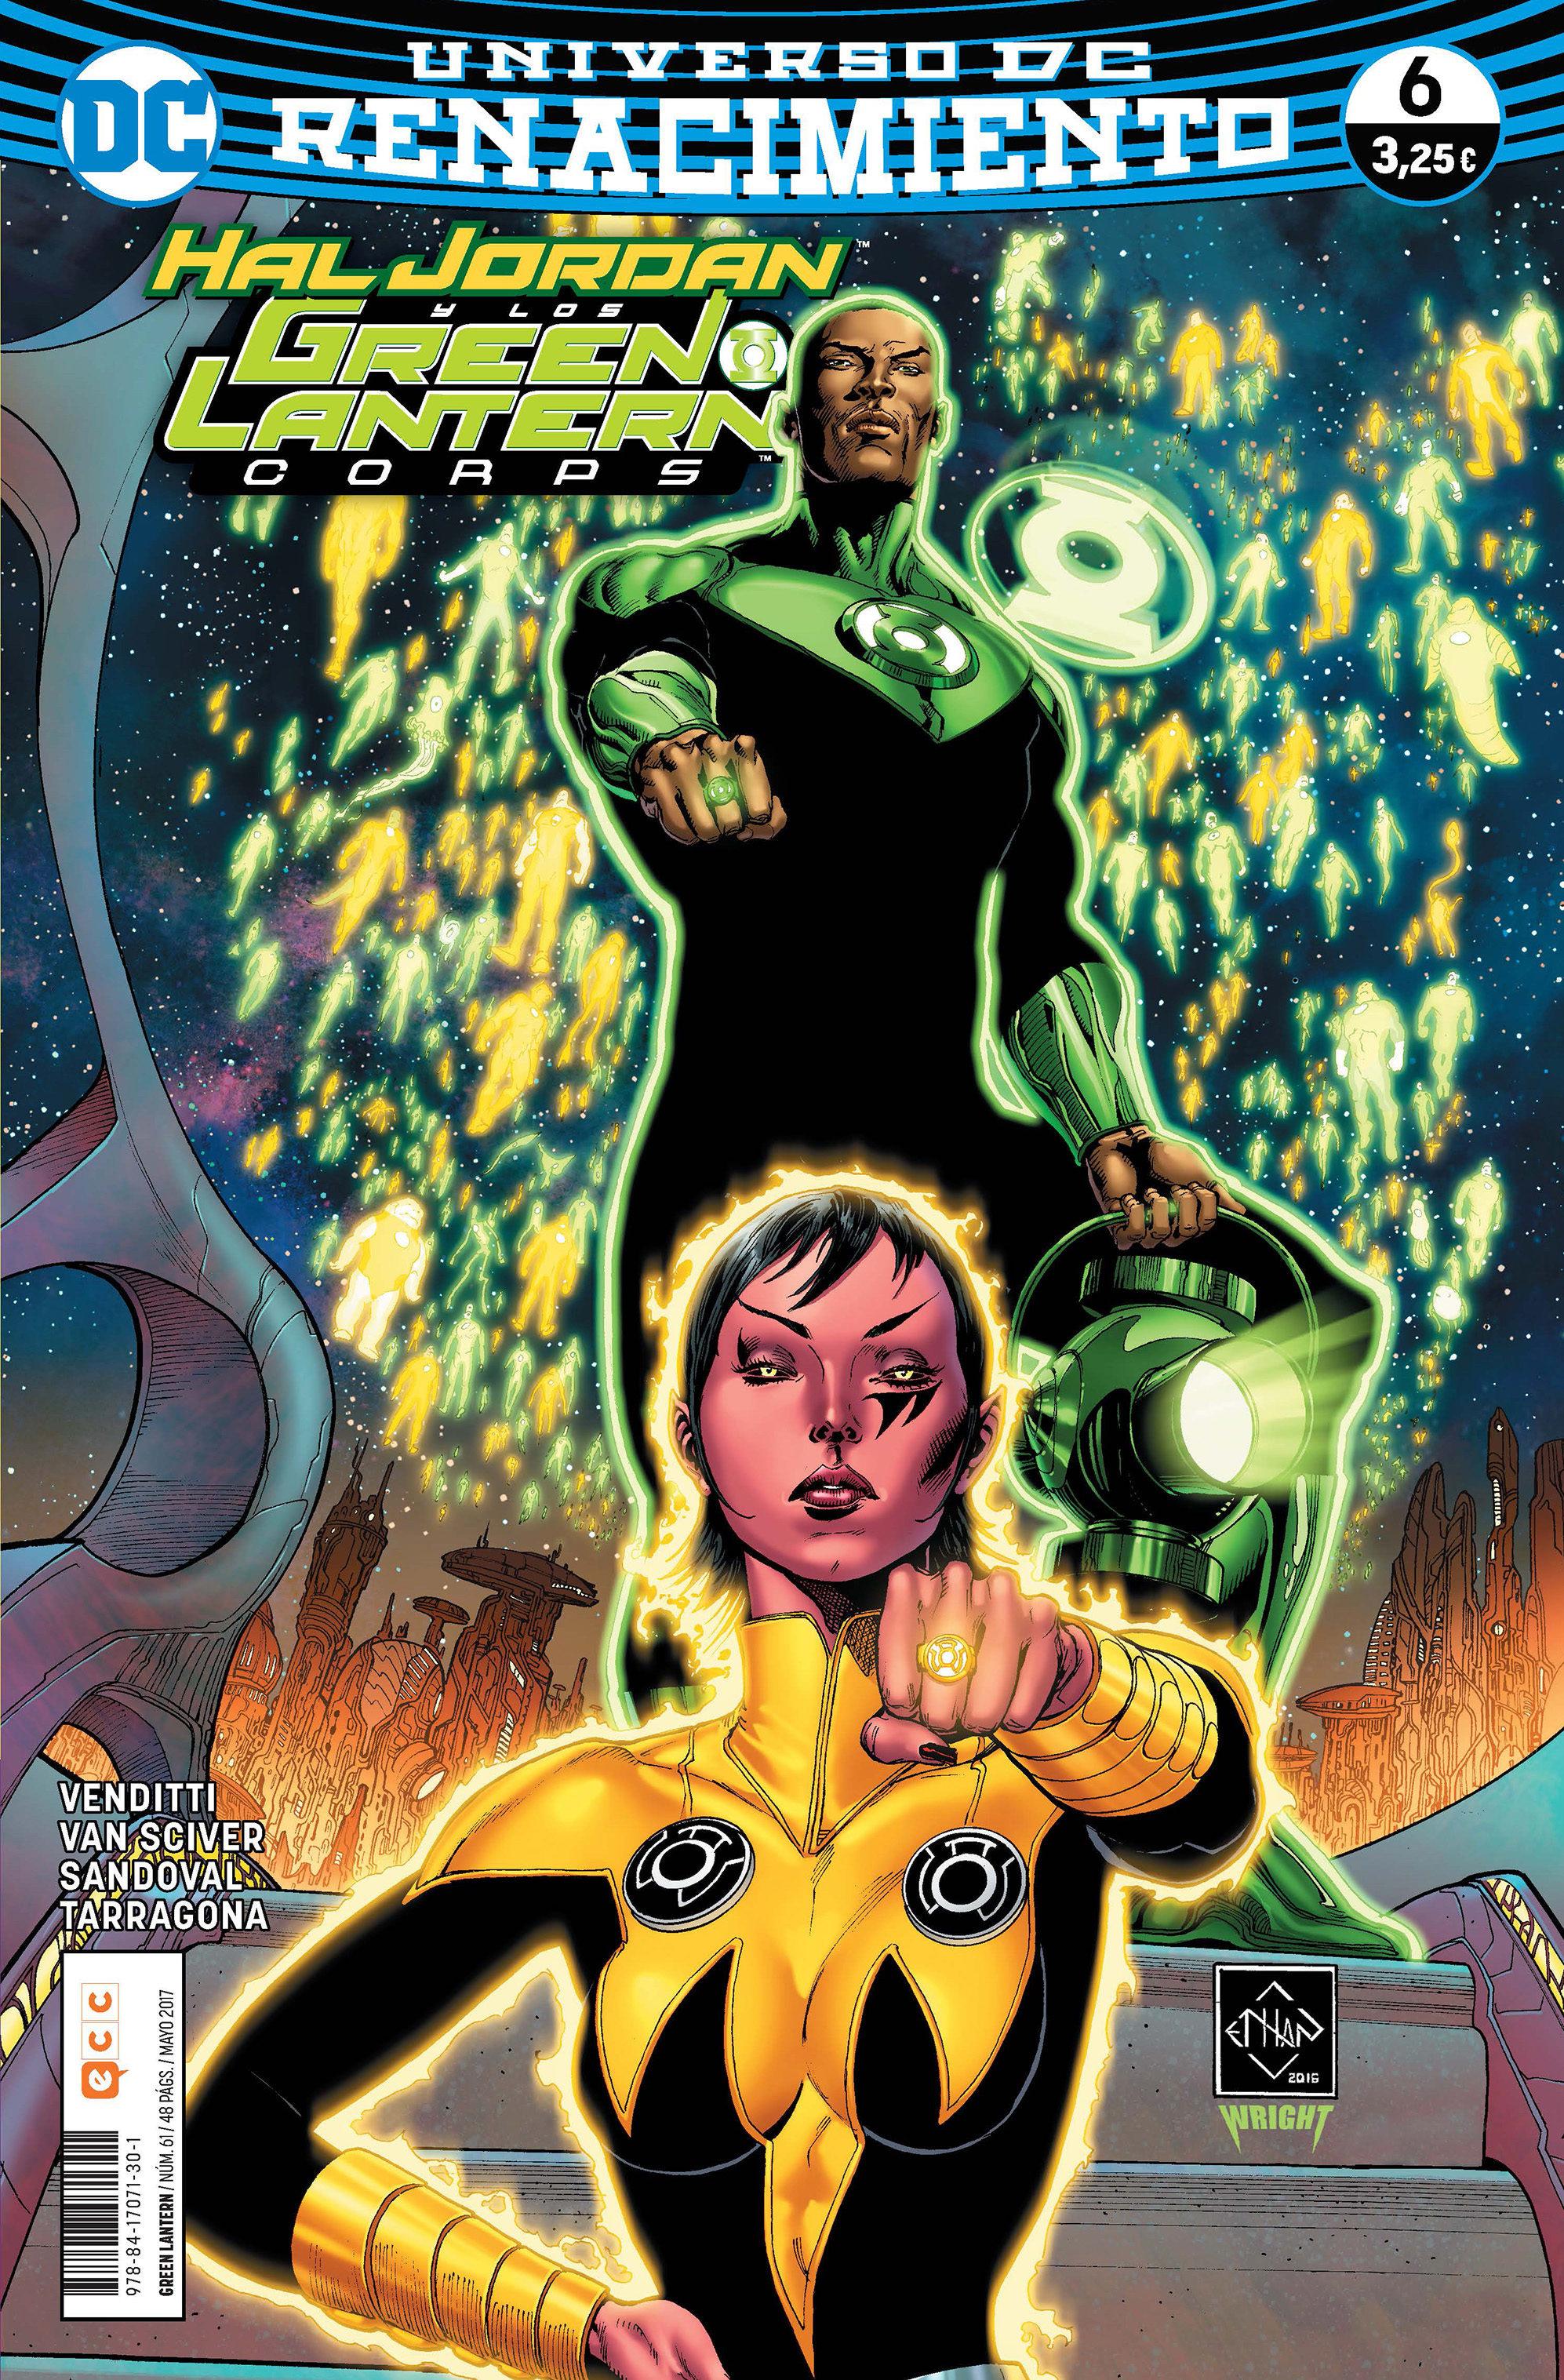 Green Lantern Nº 61 / 6 (renacimiento) - Venditti Robert